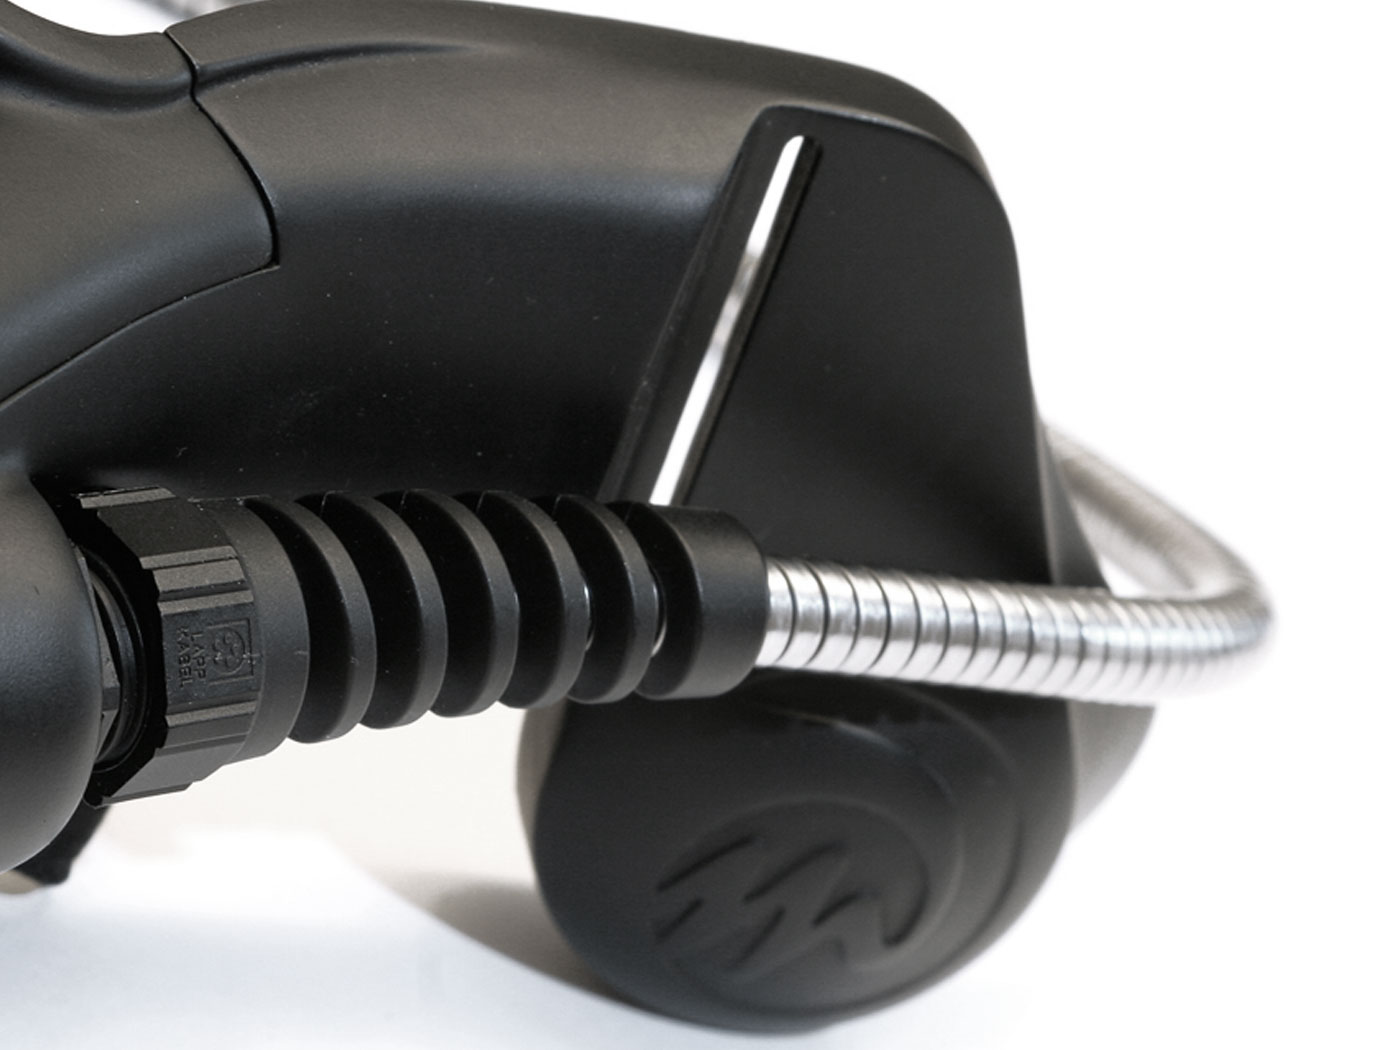 virtual-reality-headset-03